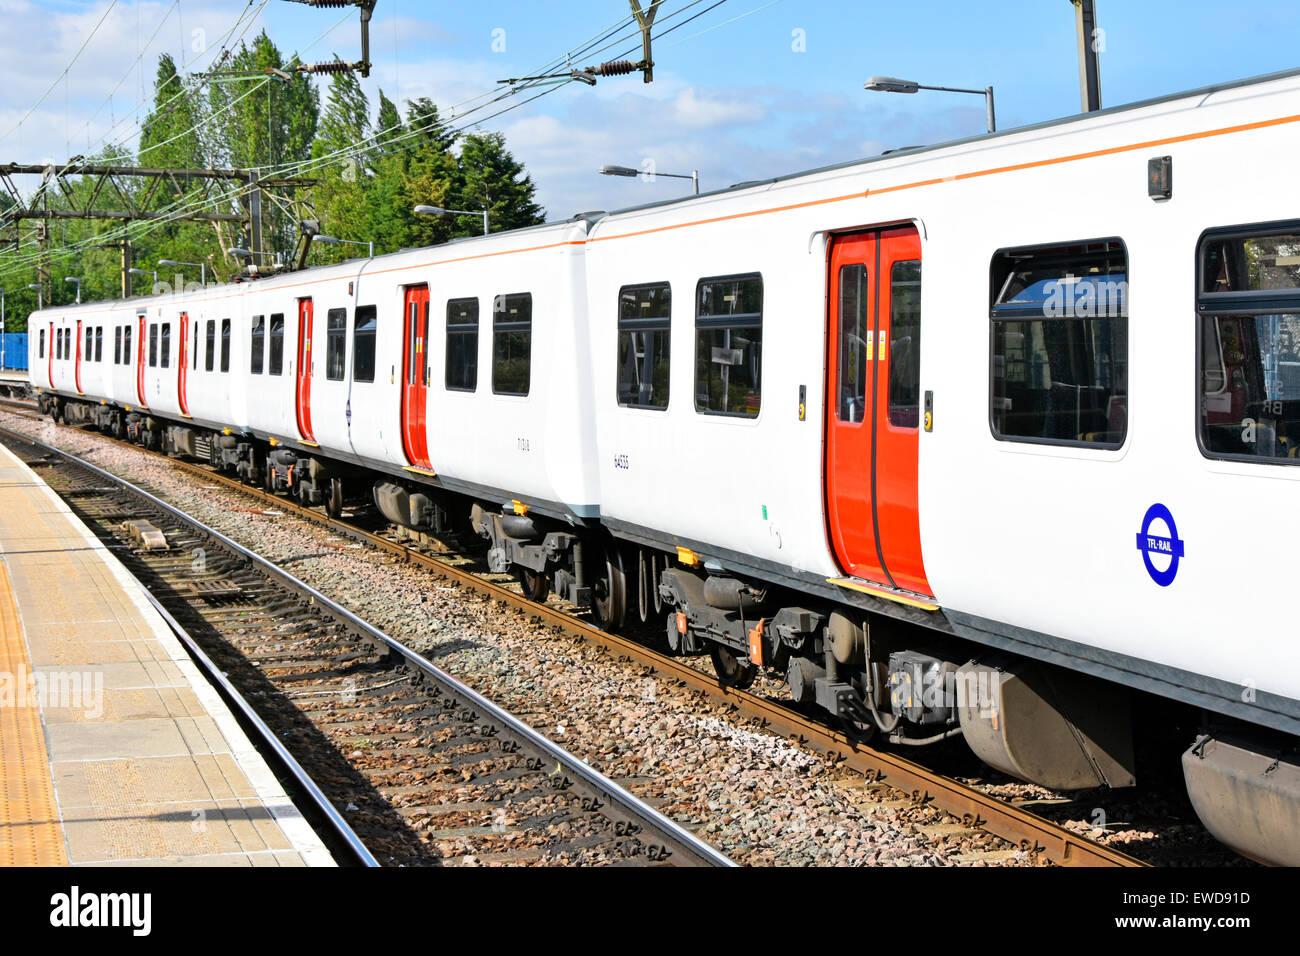 Transport for London new TFL Rail logo on Liverpool Street Metro train at Shenfield train station Essex England - Stock Image